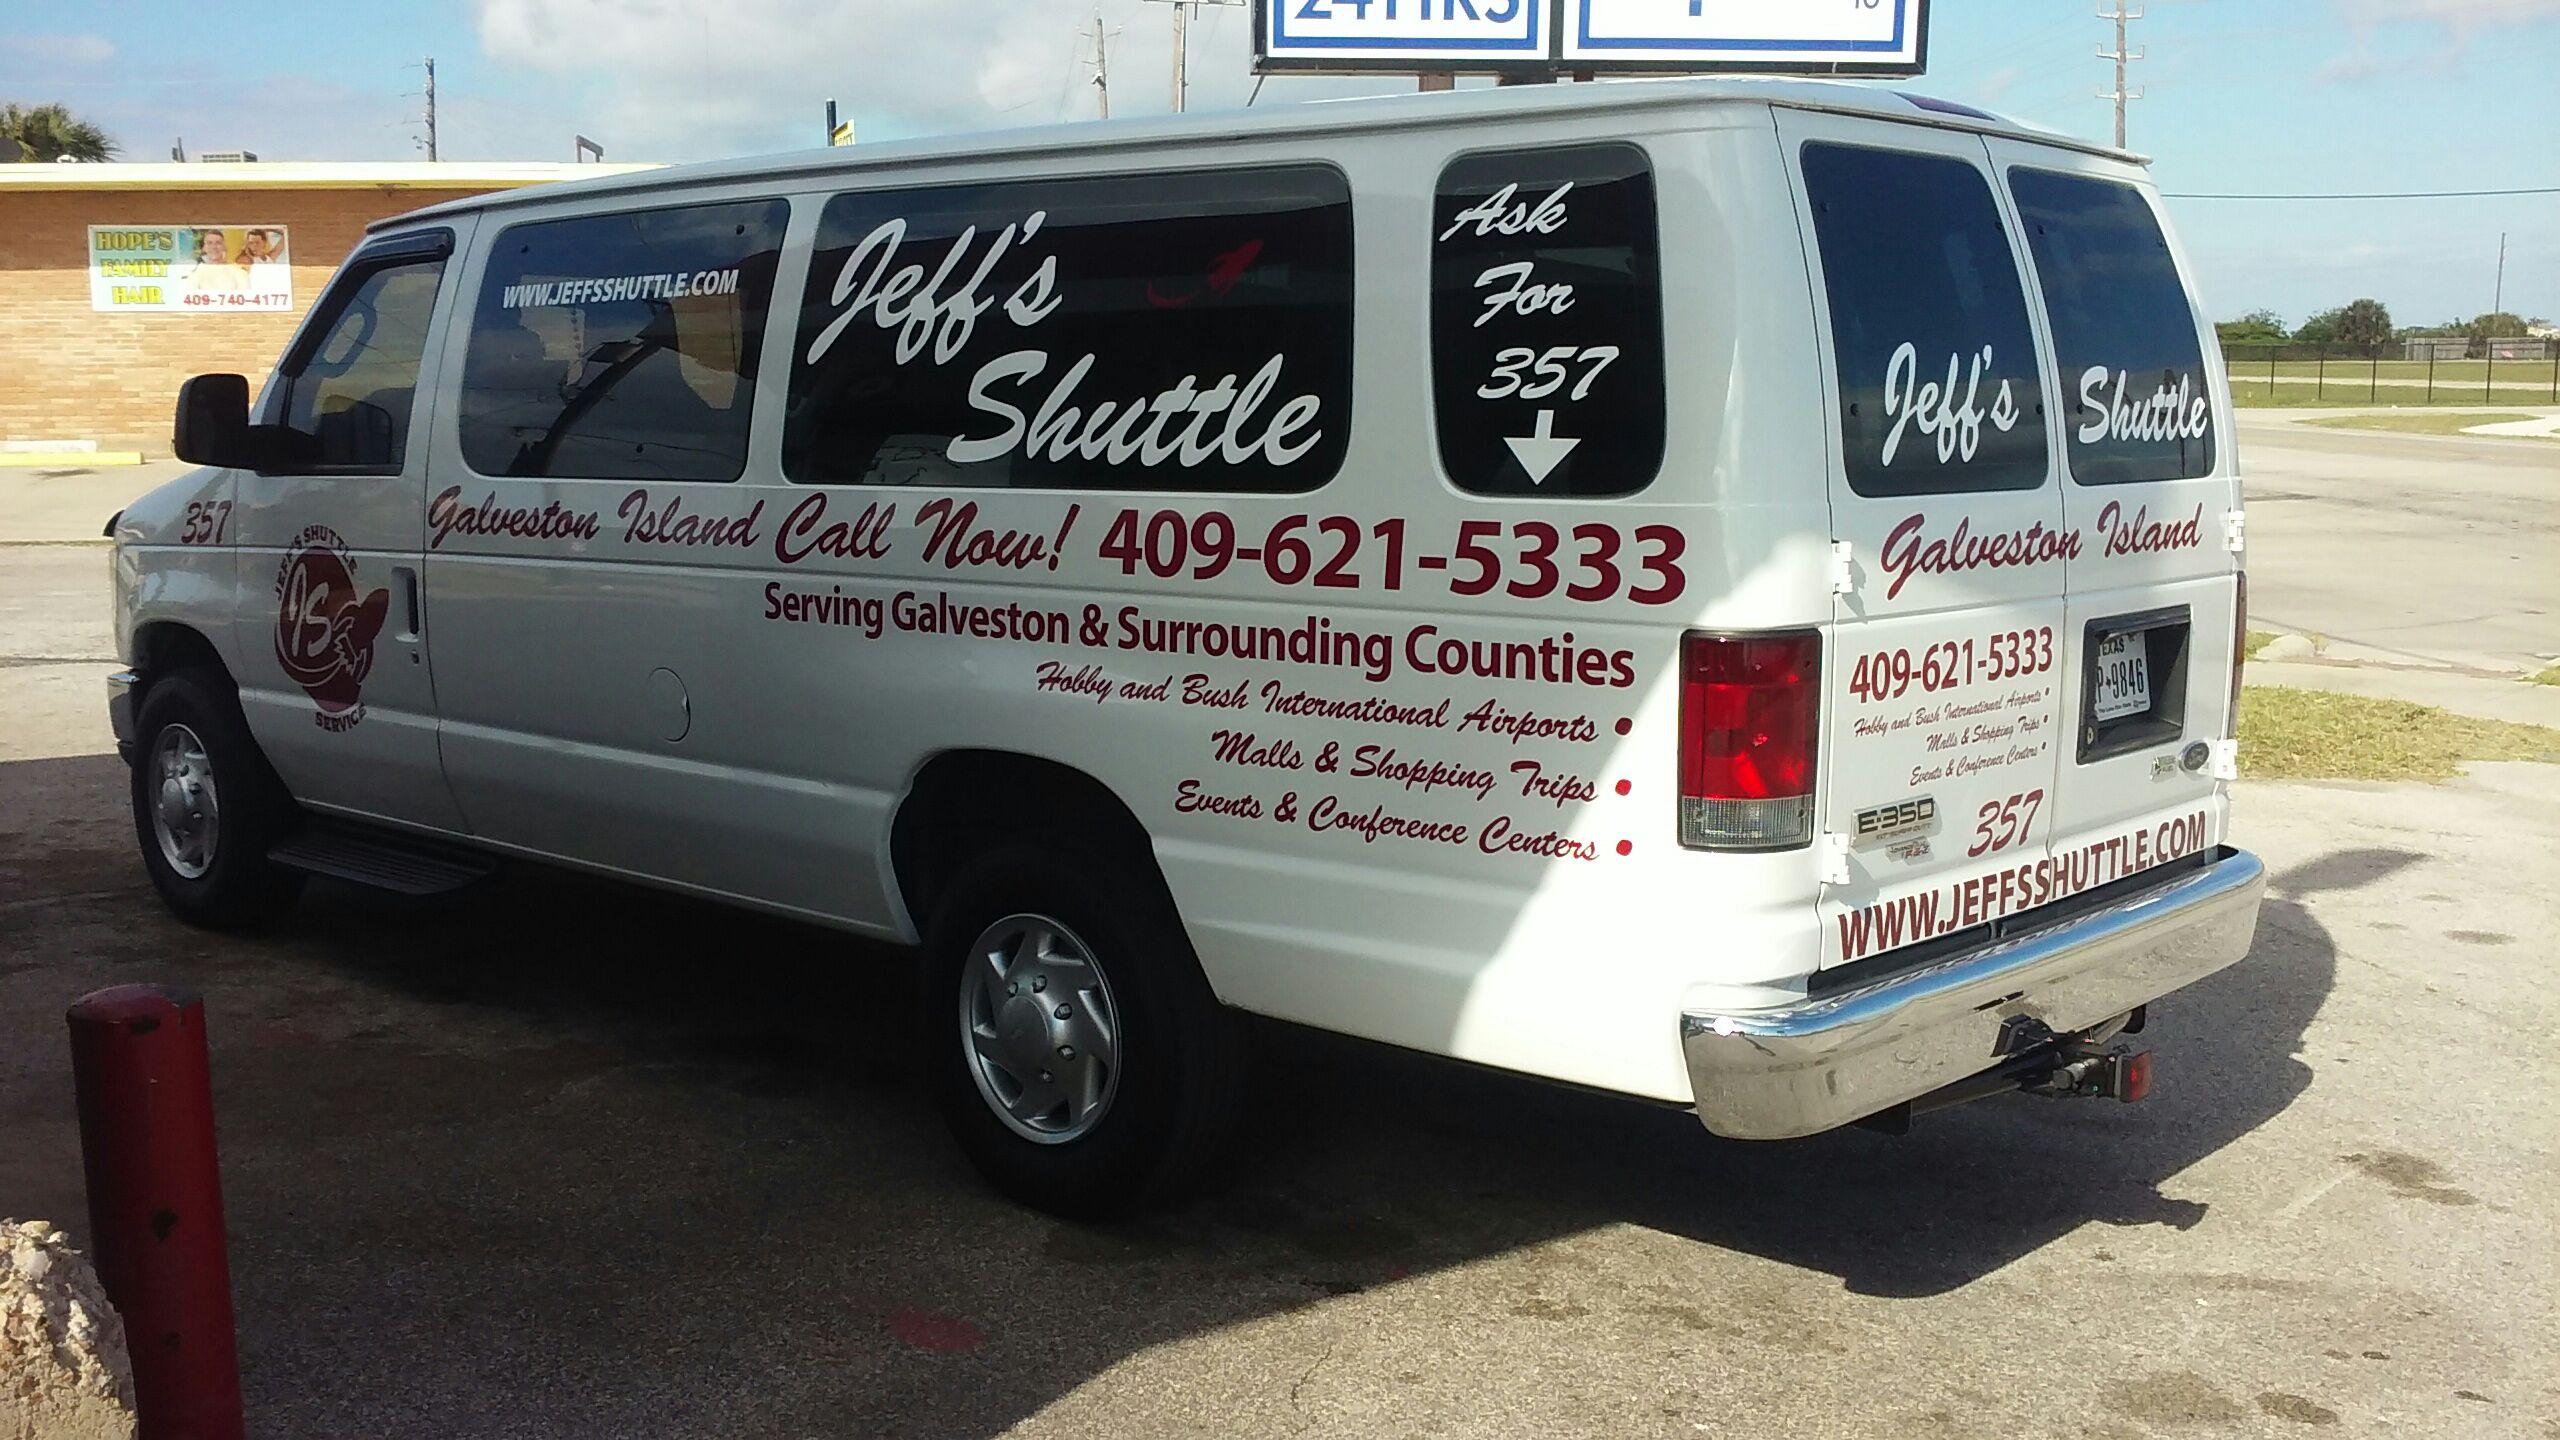 Galveston Limousine Service Promo Code